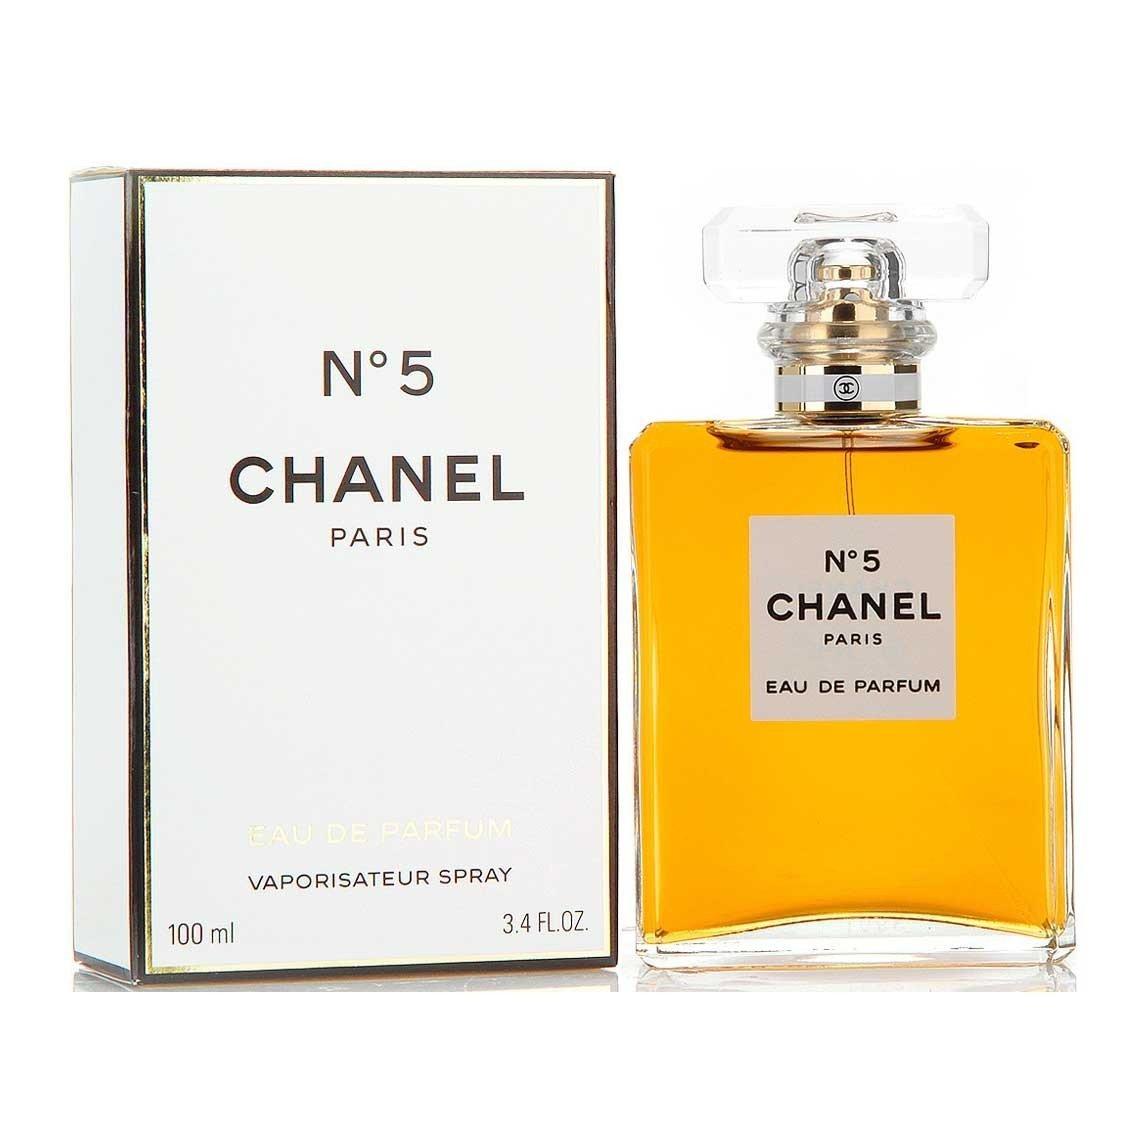 Amazoncom C H A N E L No 5 Eau De Parfum 34 Oz 100 Ml Spray